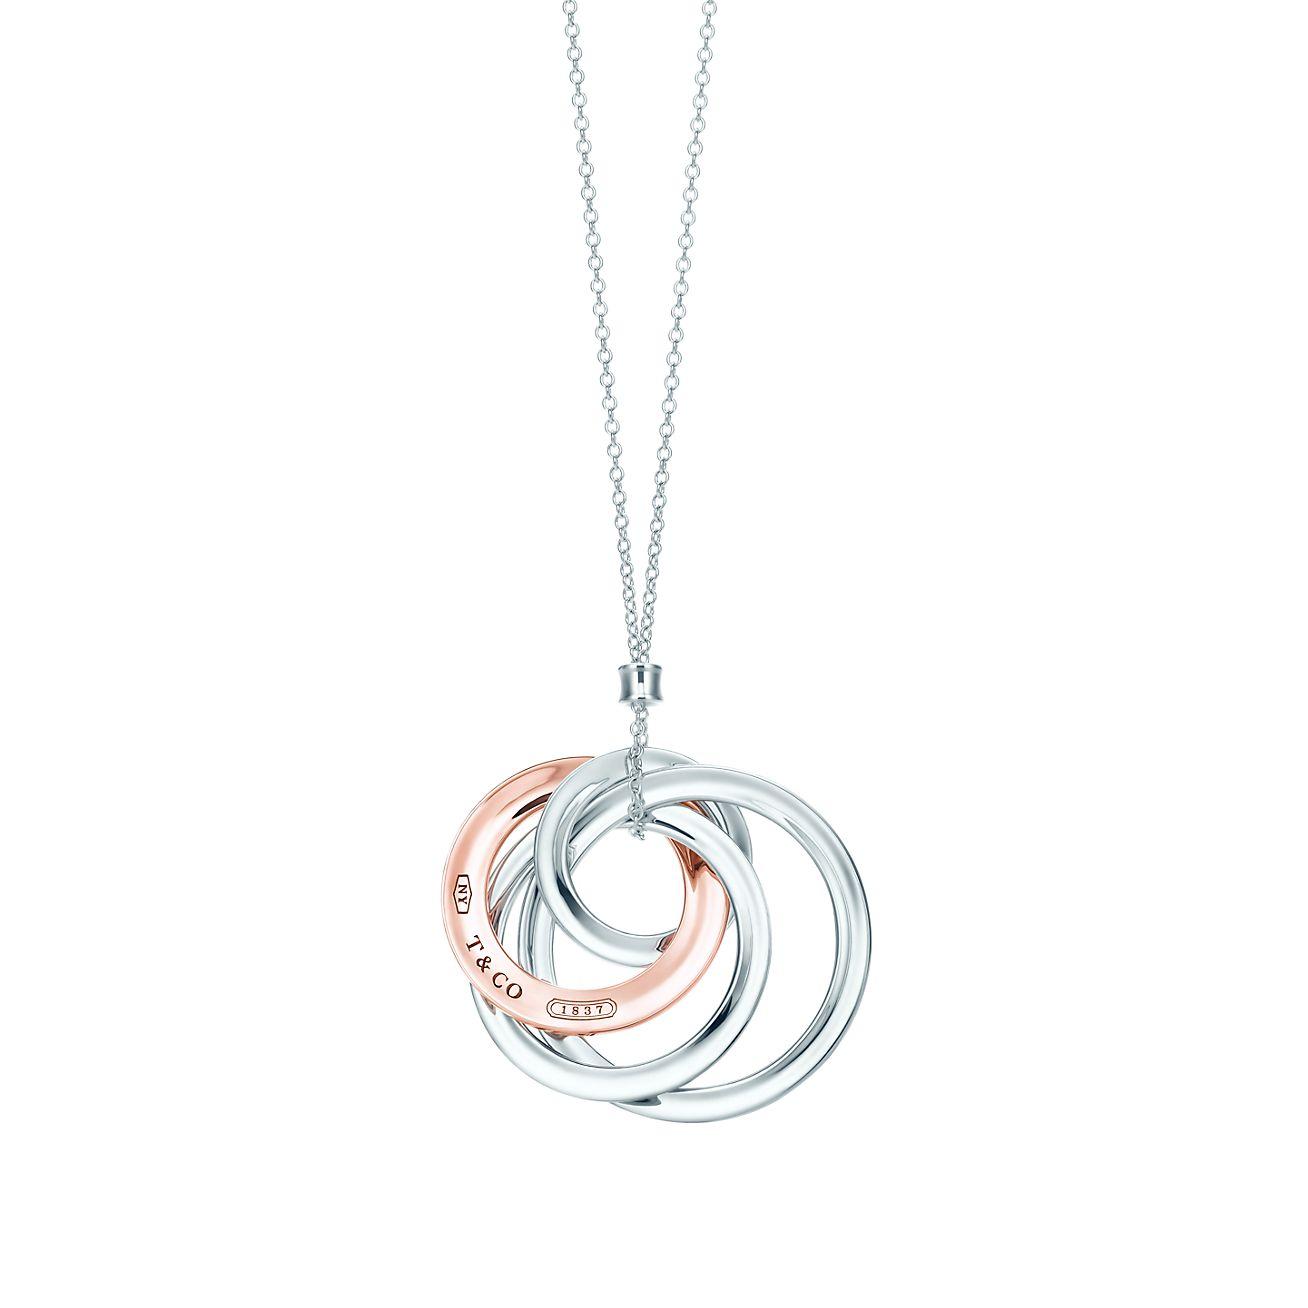 Tiffany 1837 interlocking pendant in sterling silver and Rubedo metal Tiffany & Co.